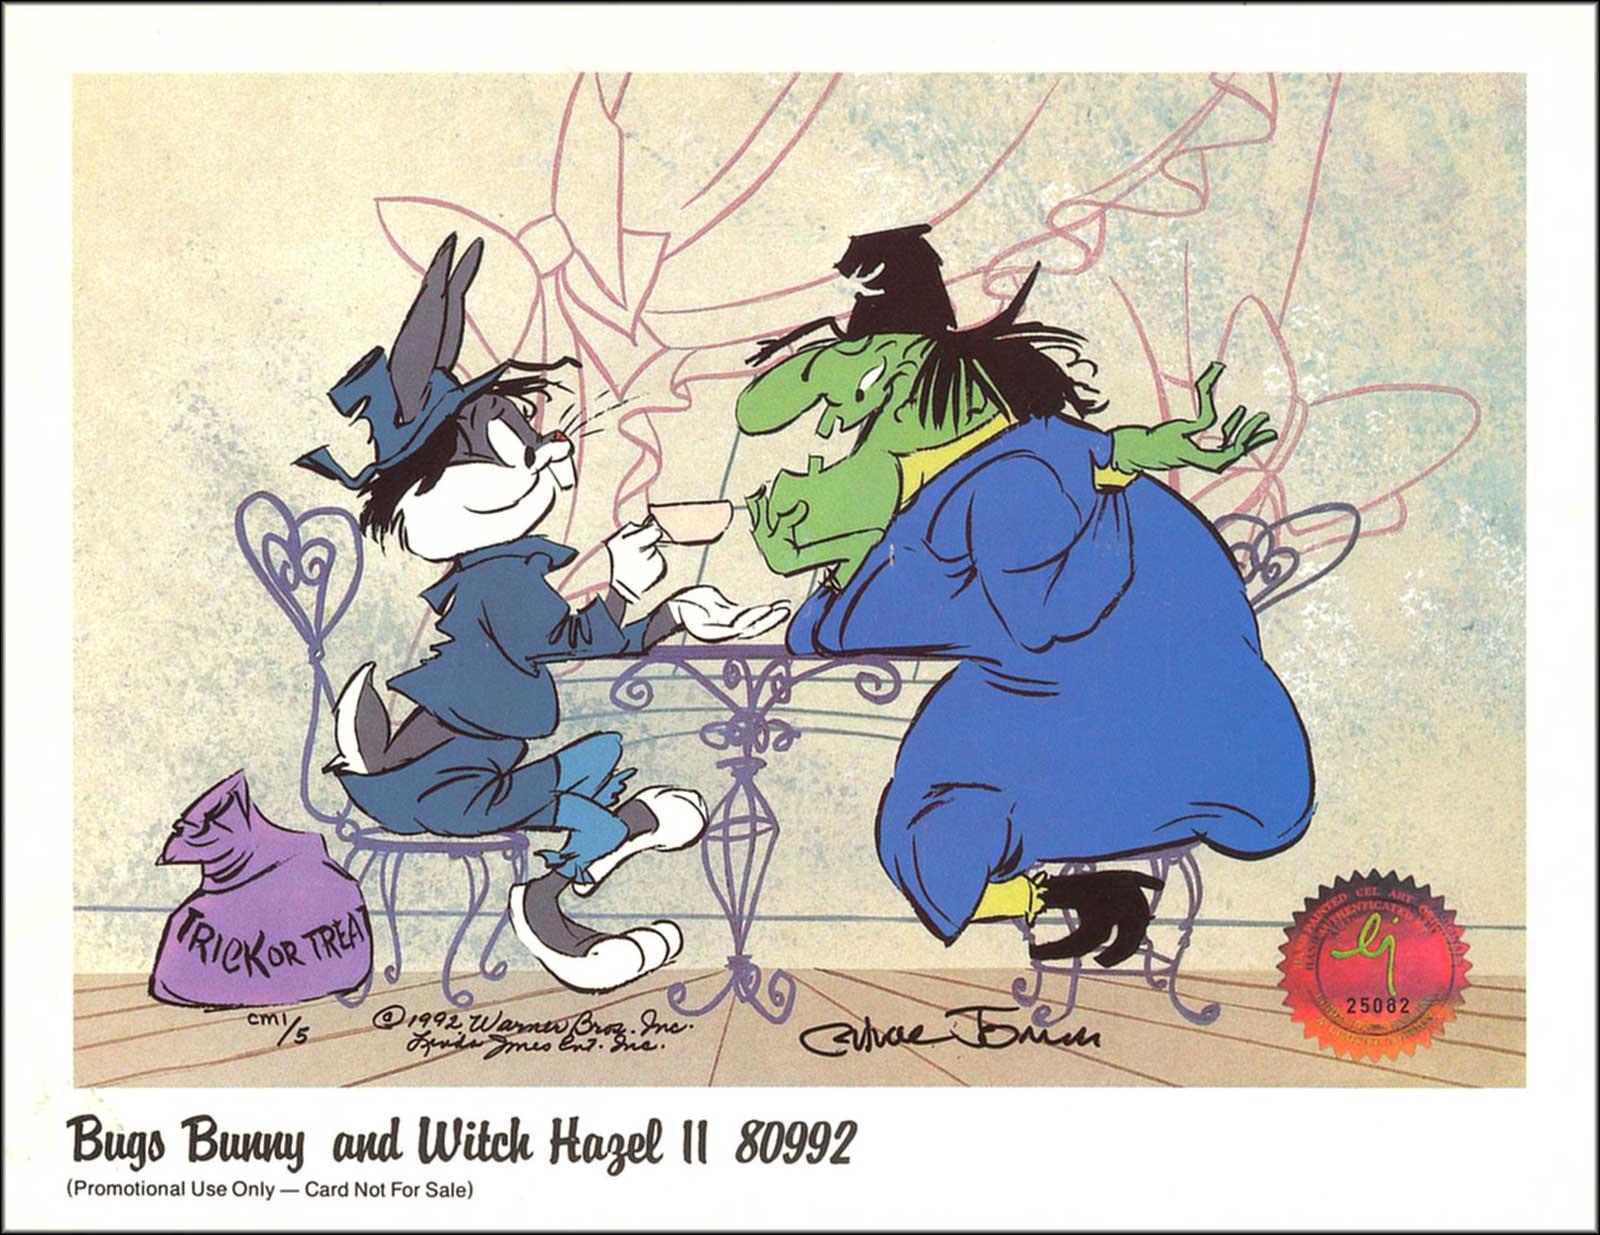 Haphazard slapdash effects witch hazel looney tunes for Old house tunes